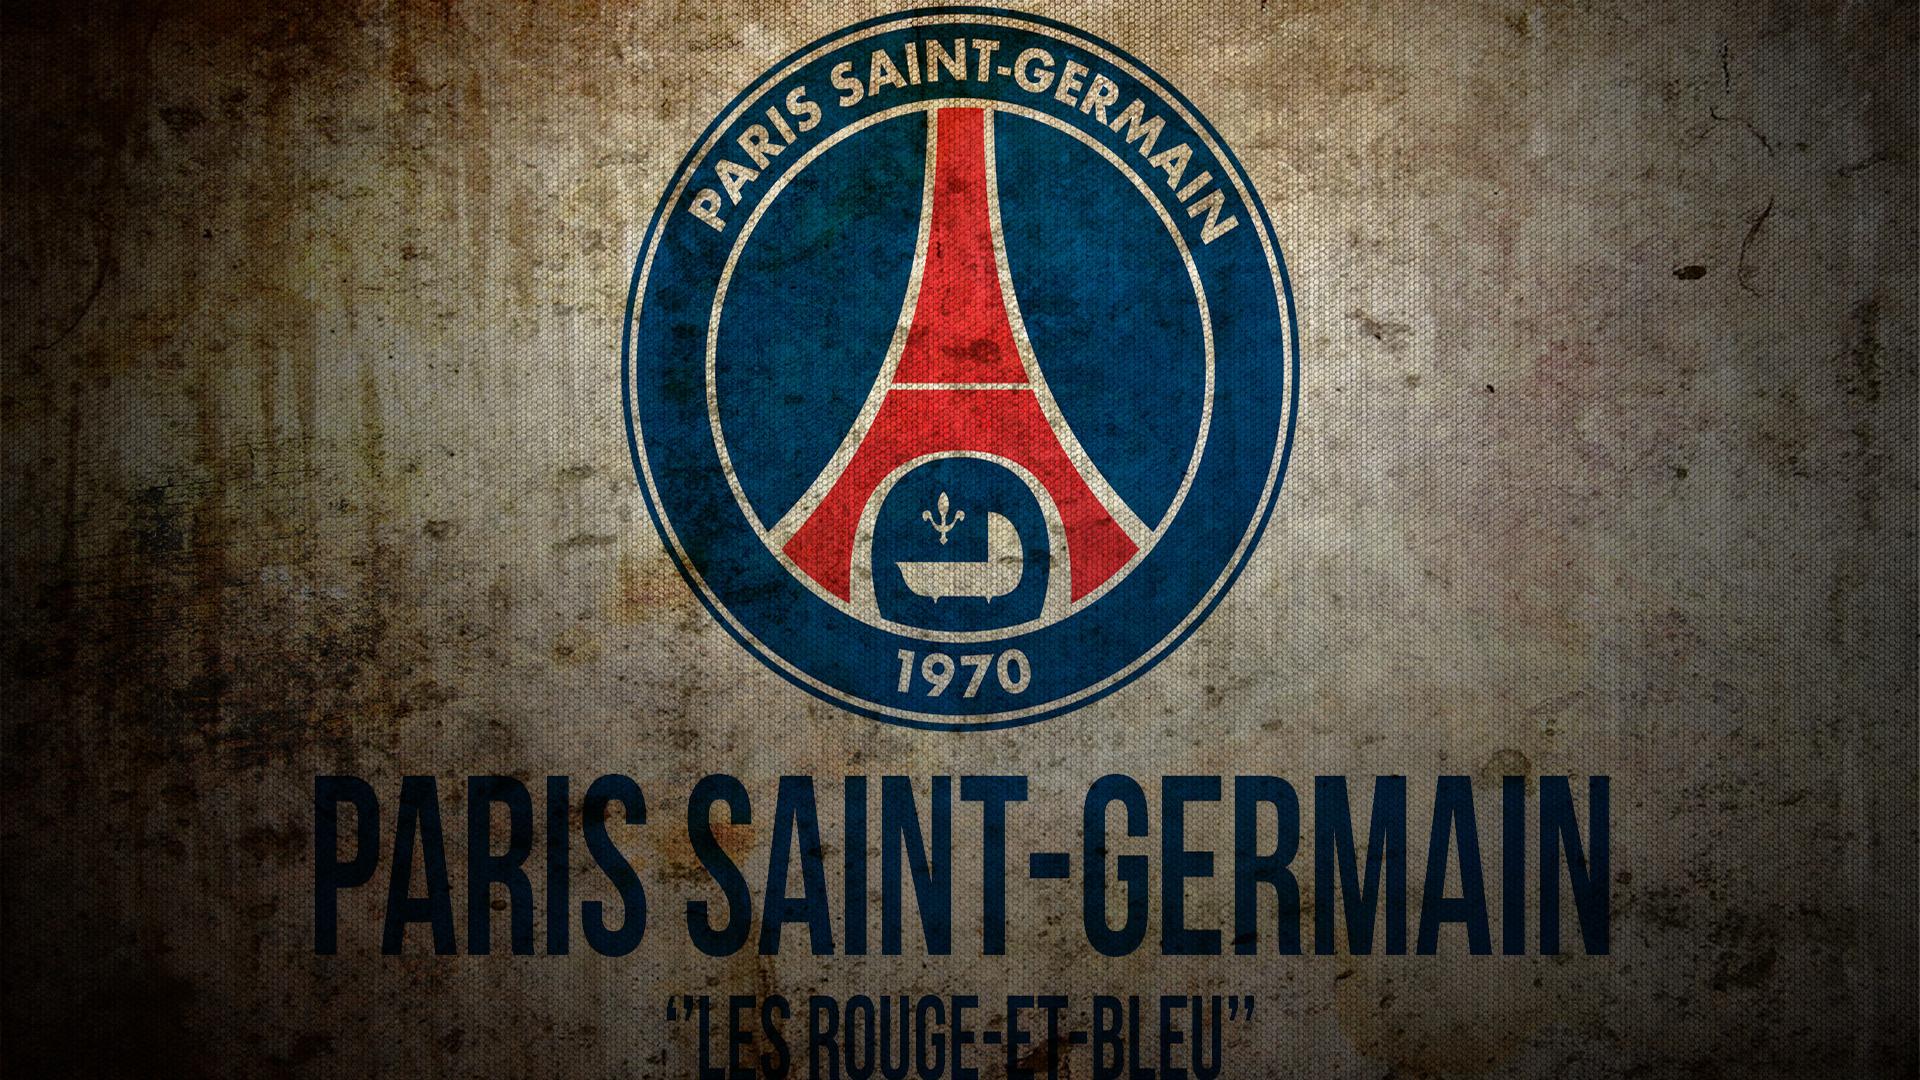 Thw Kiel Paris St Germain